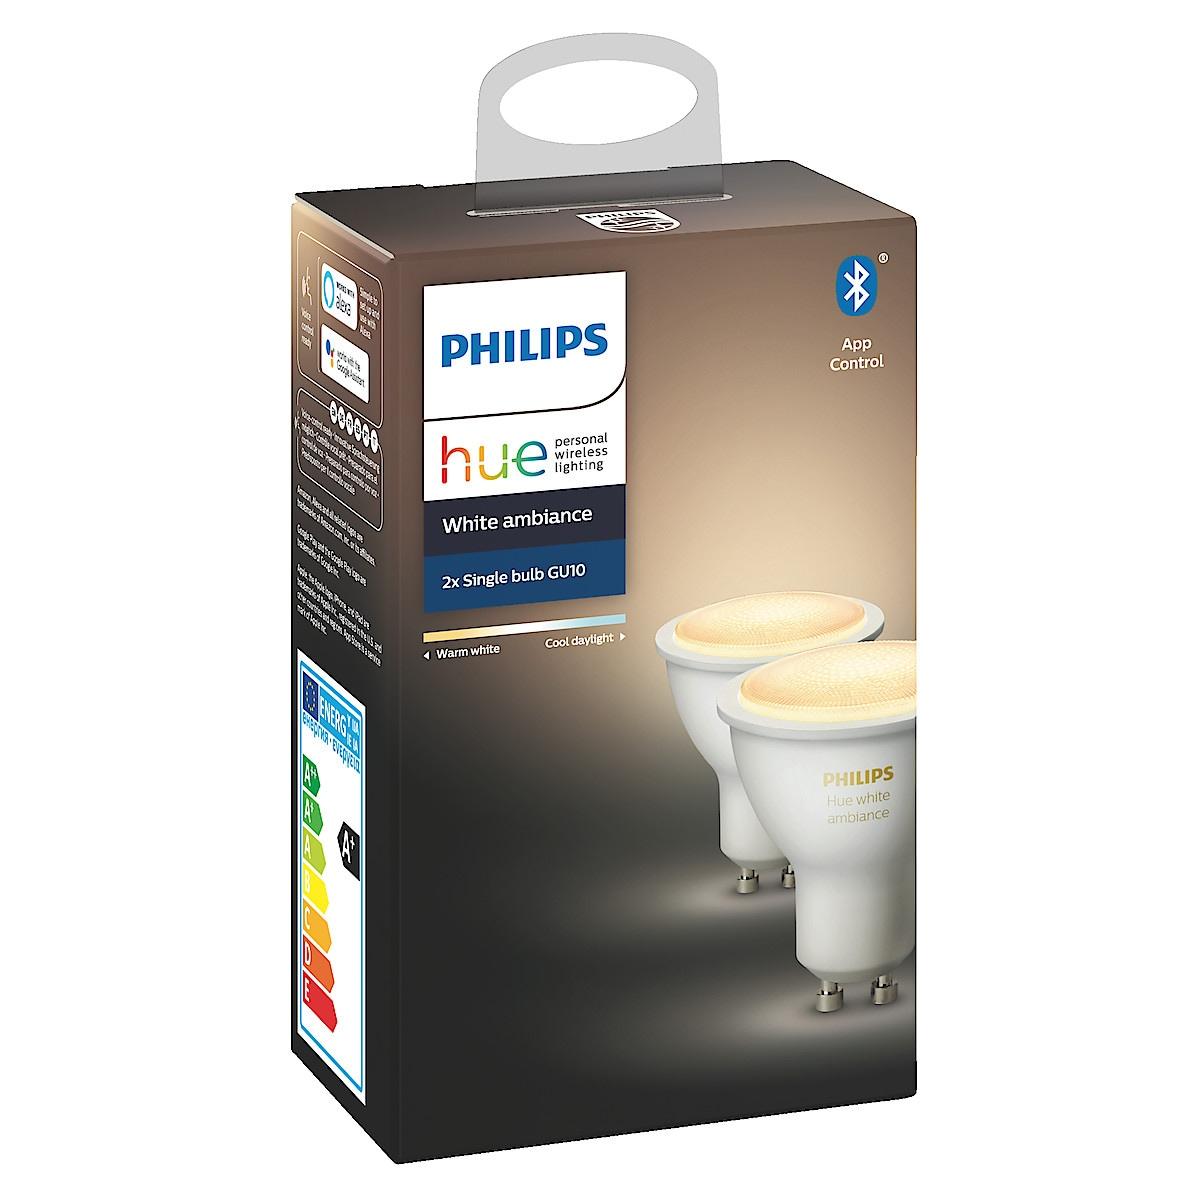 Philips Hue Ambiance LED-pære 6 W GU10 2 stk/pk, Bluetooth